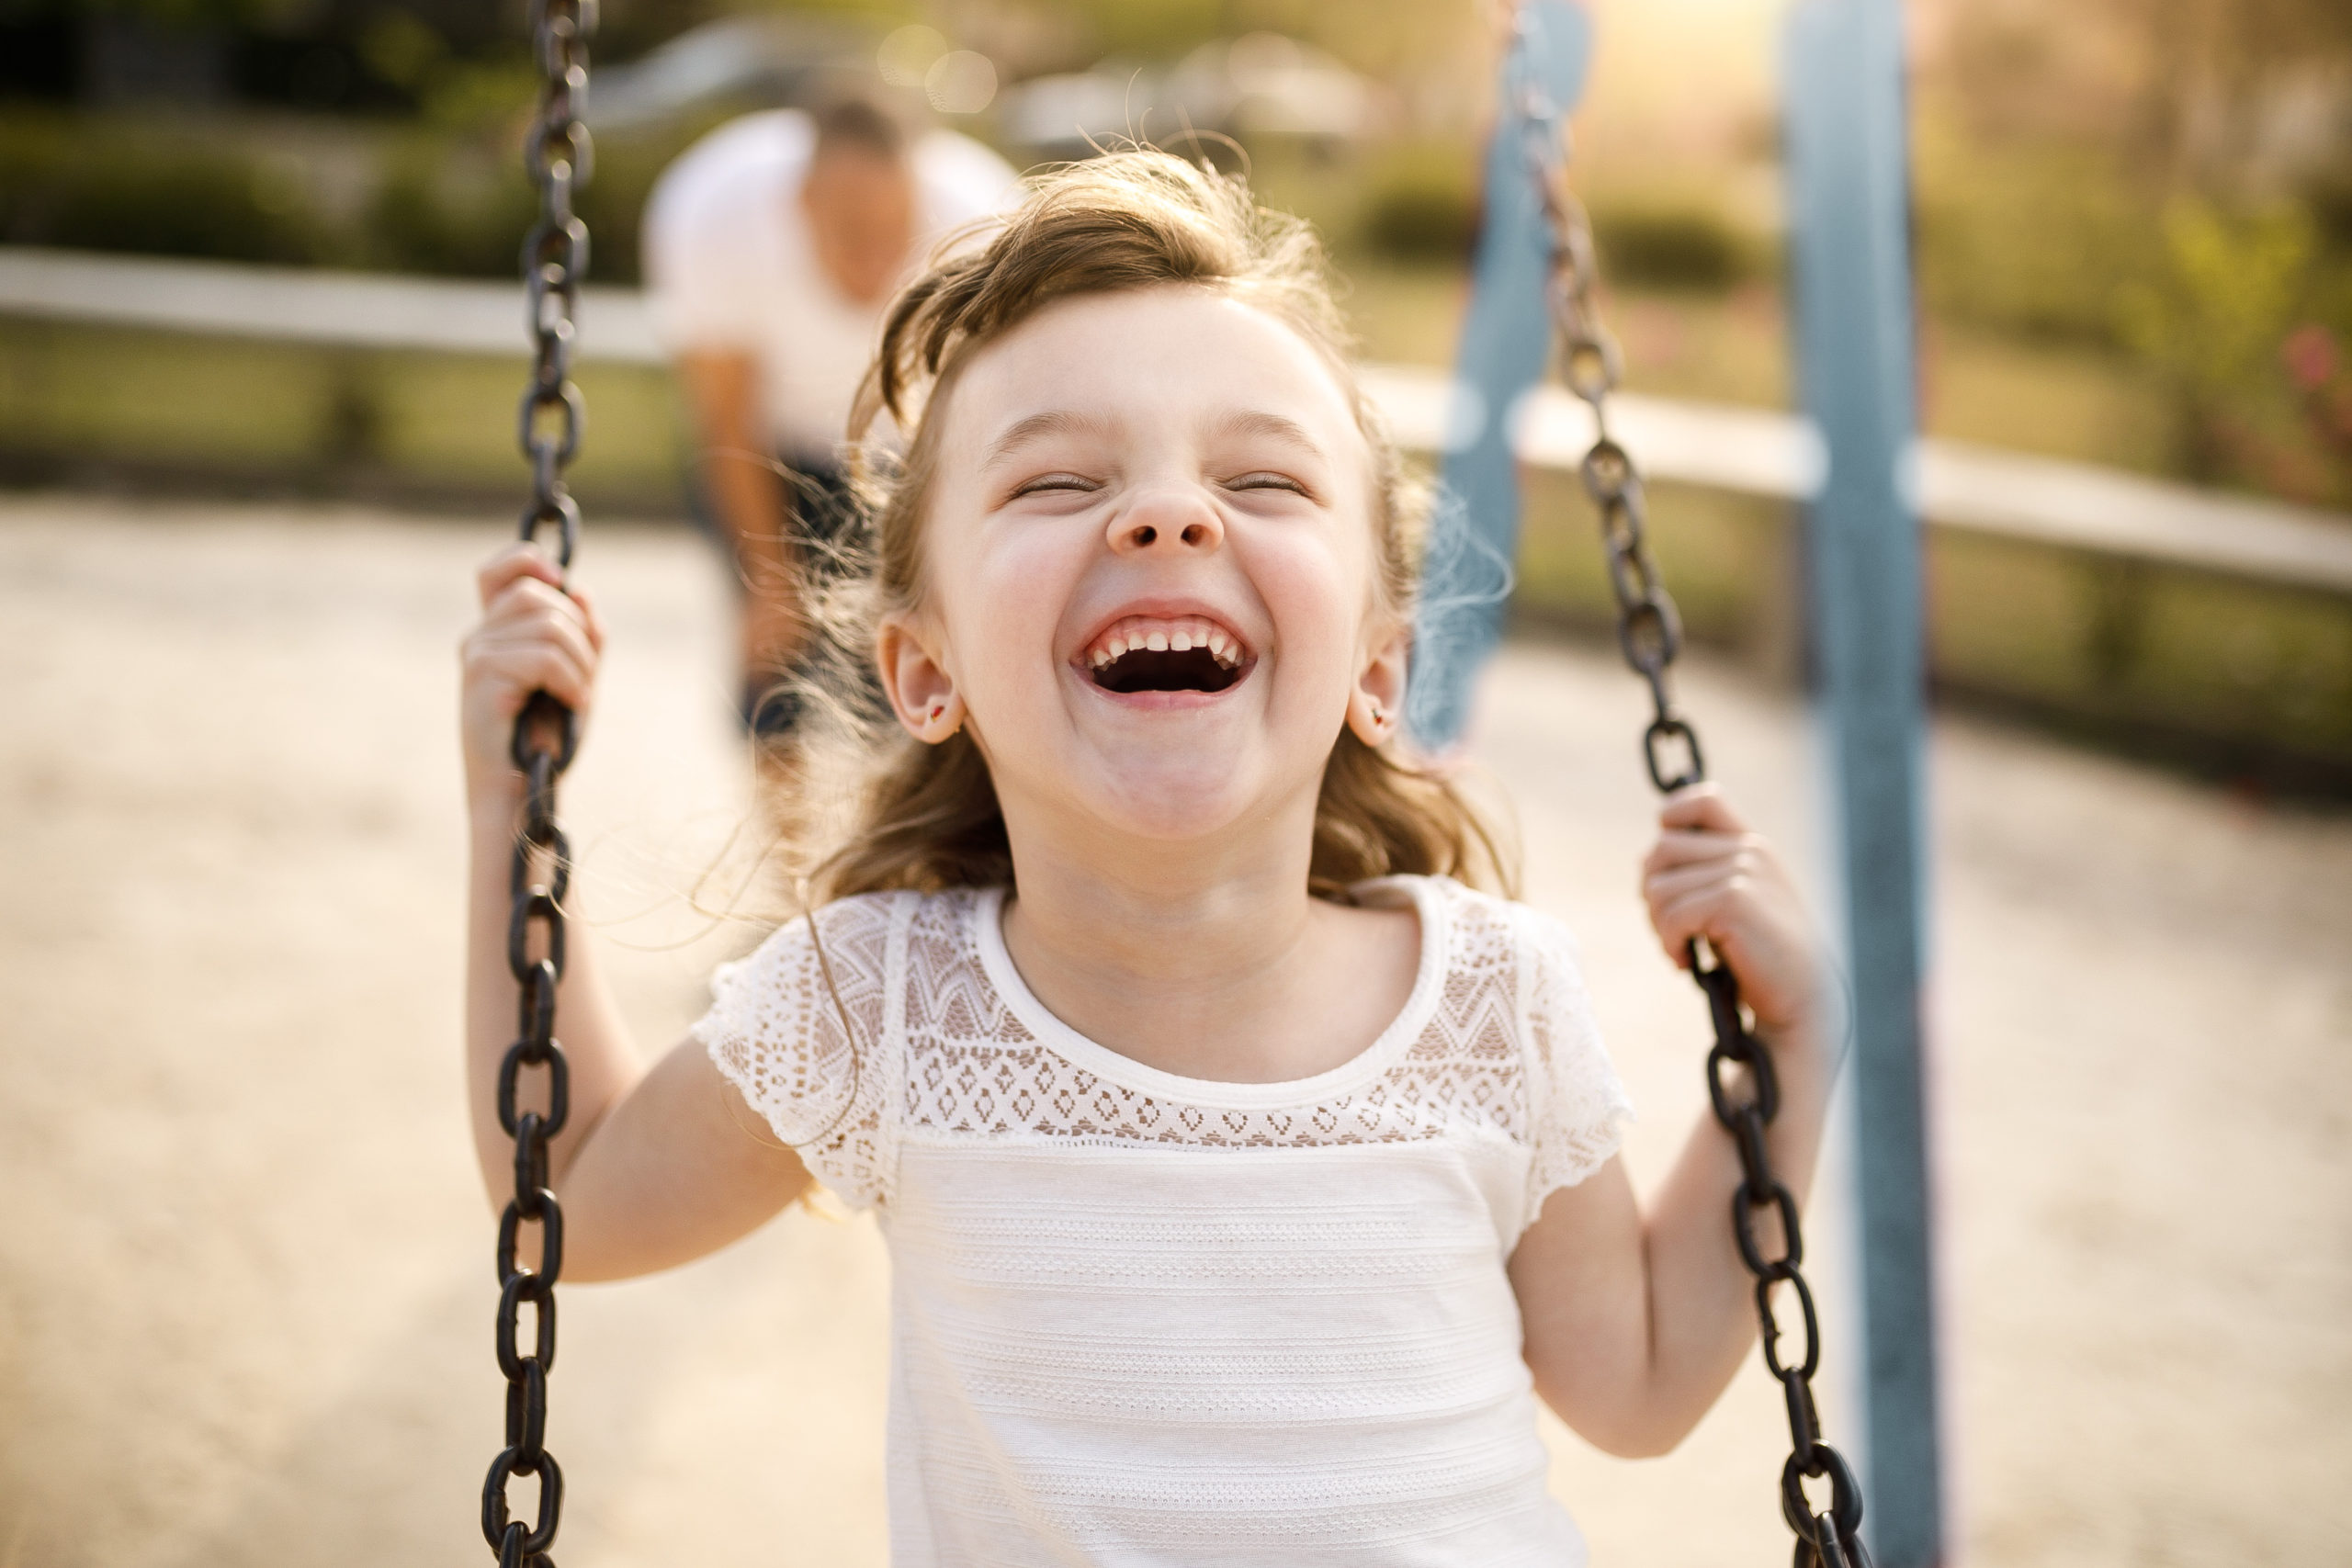 Neurofibromatose Aufmerksamkeitsstörung ADS ADHS Kinder Forschung